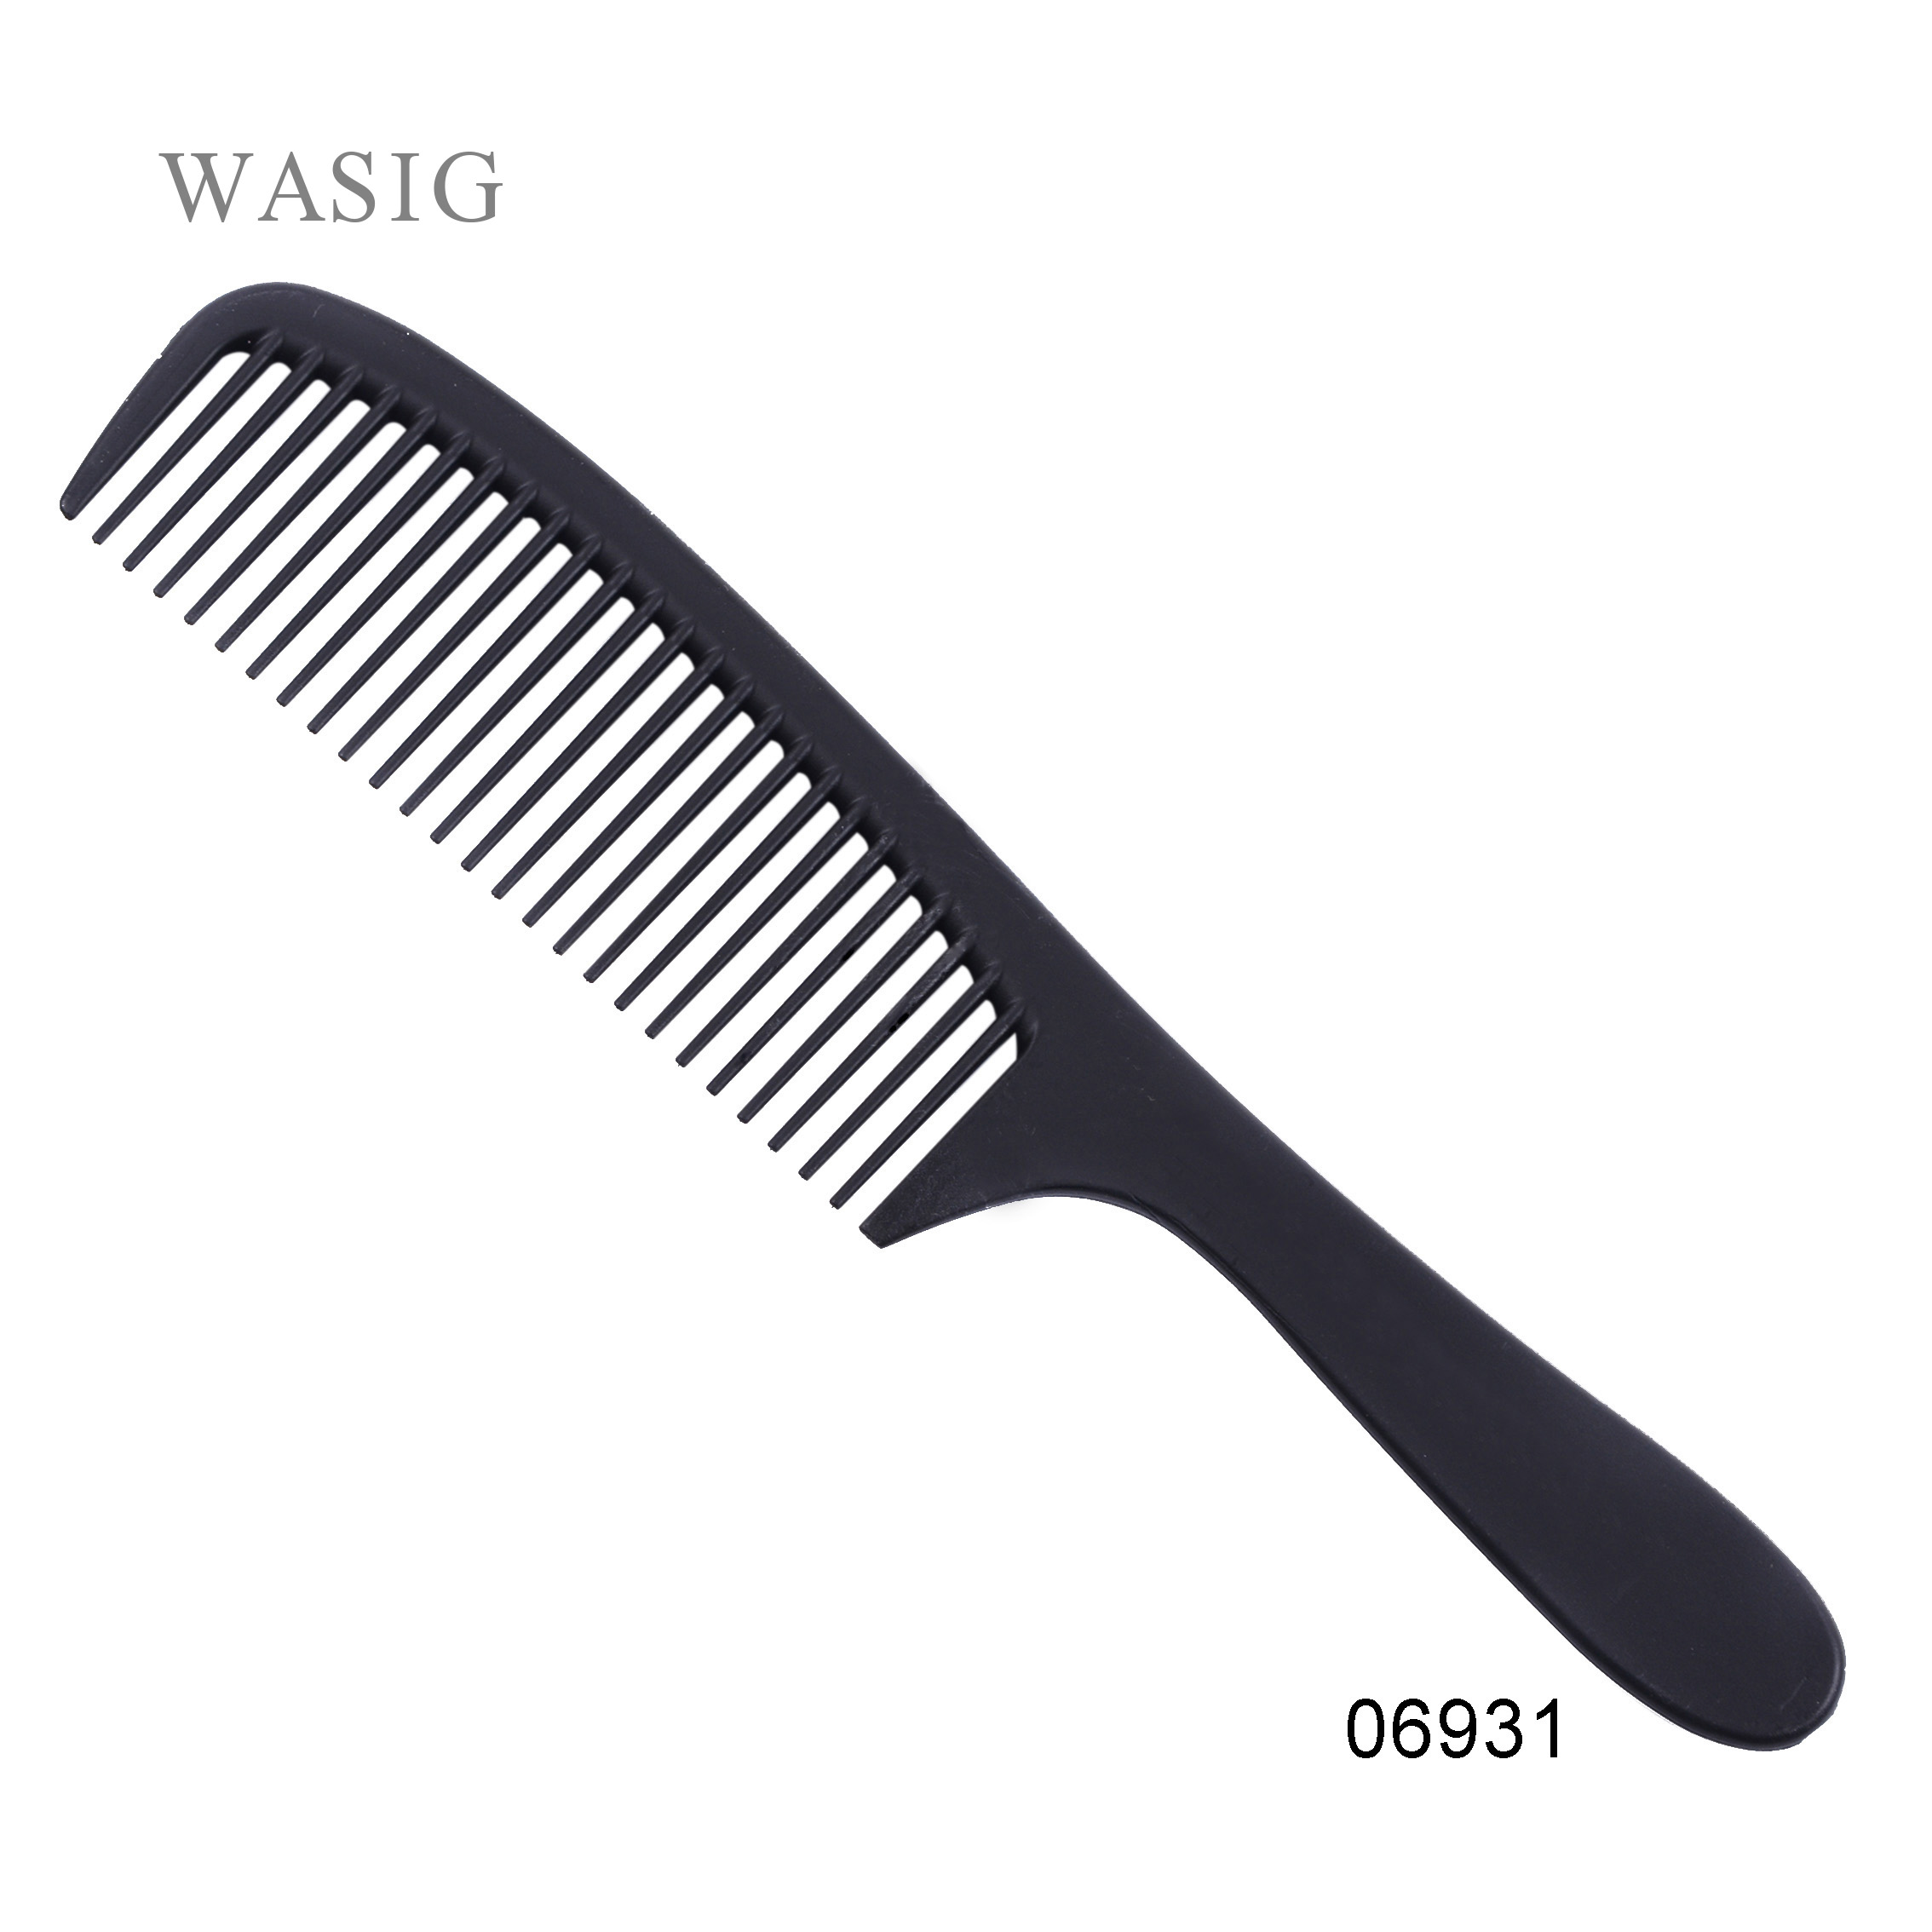 1 Pcs Large Carbon Anti Static Comb Heat Resistant Antistatic Cutting Comb